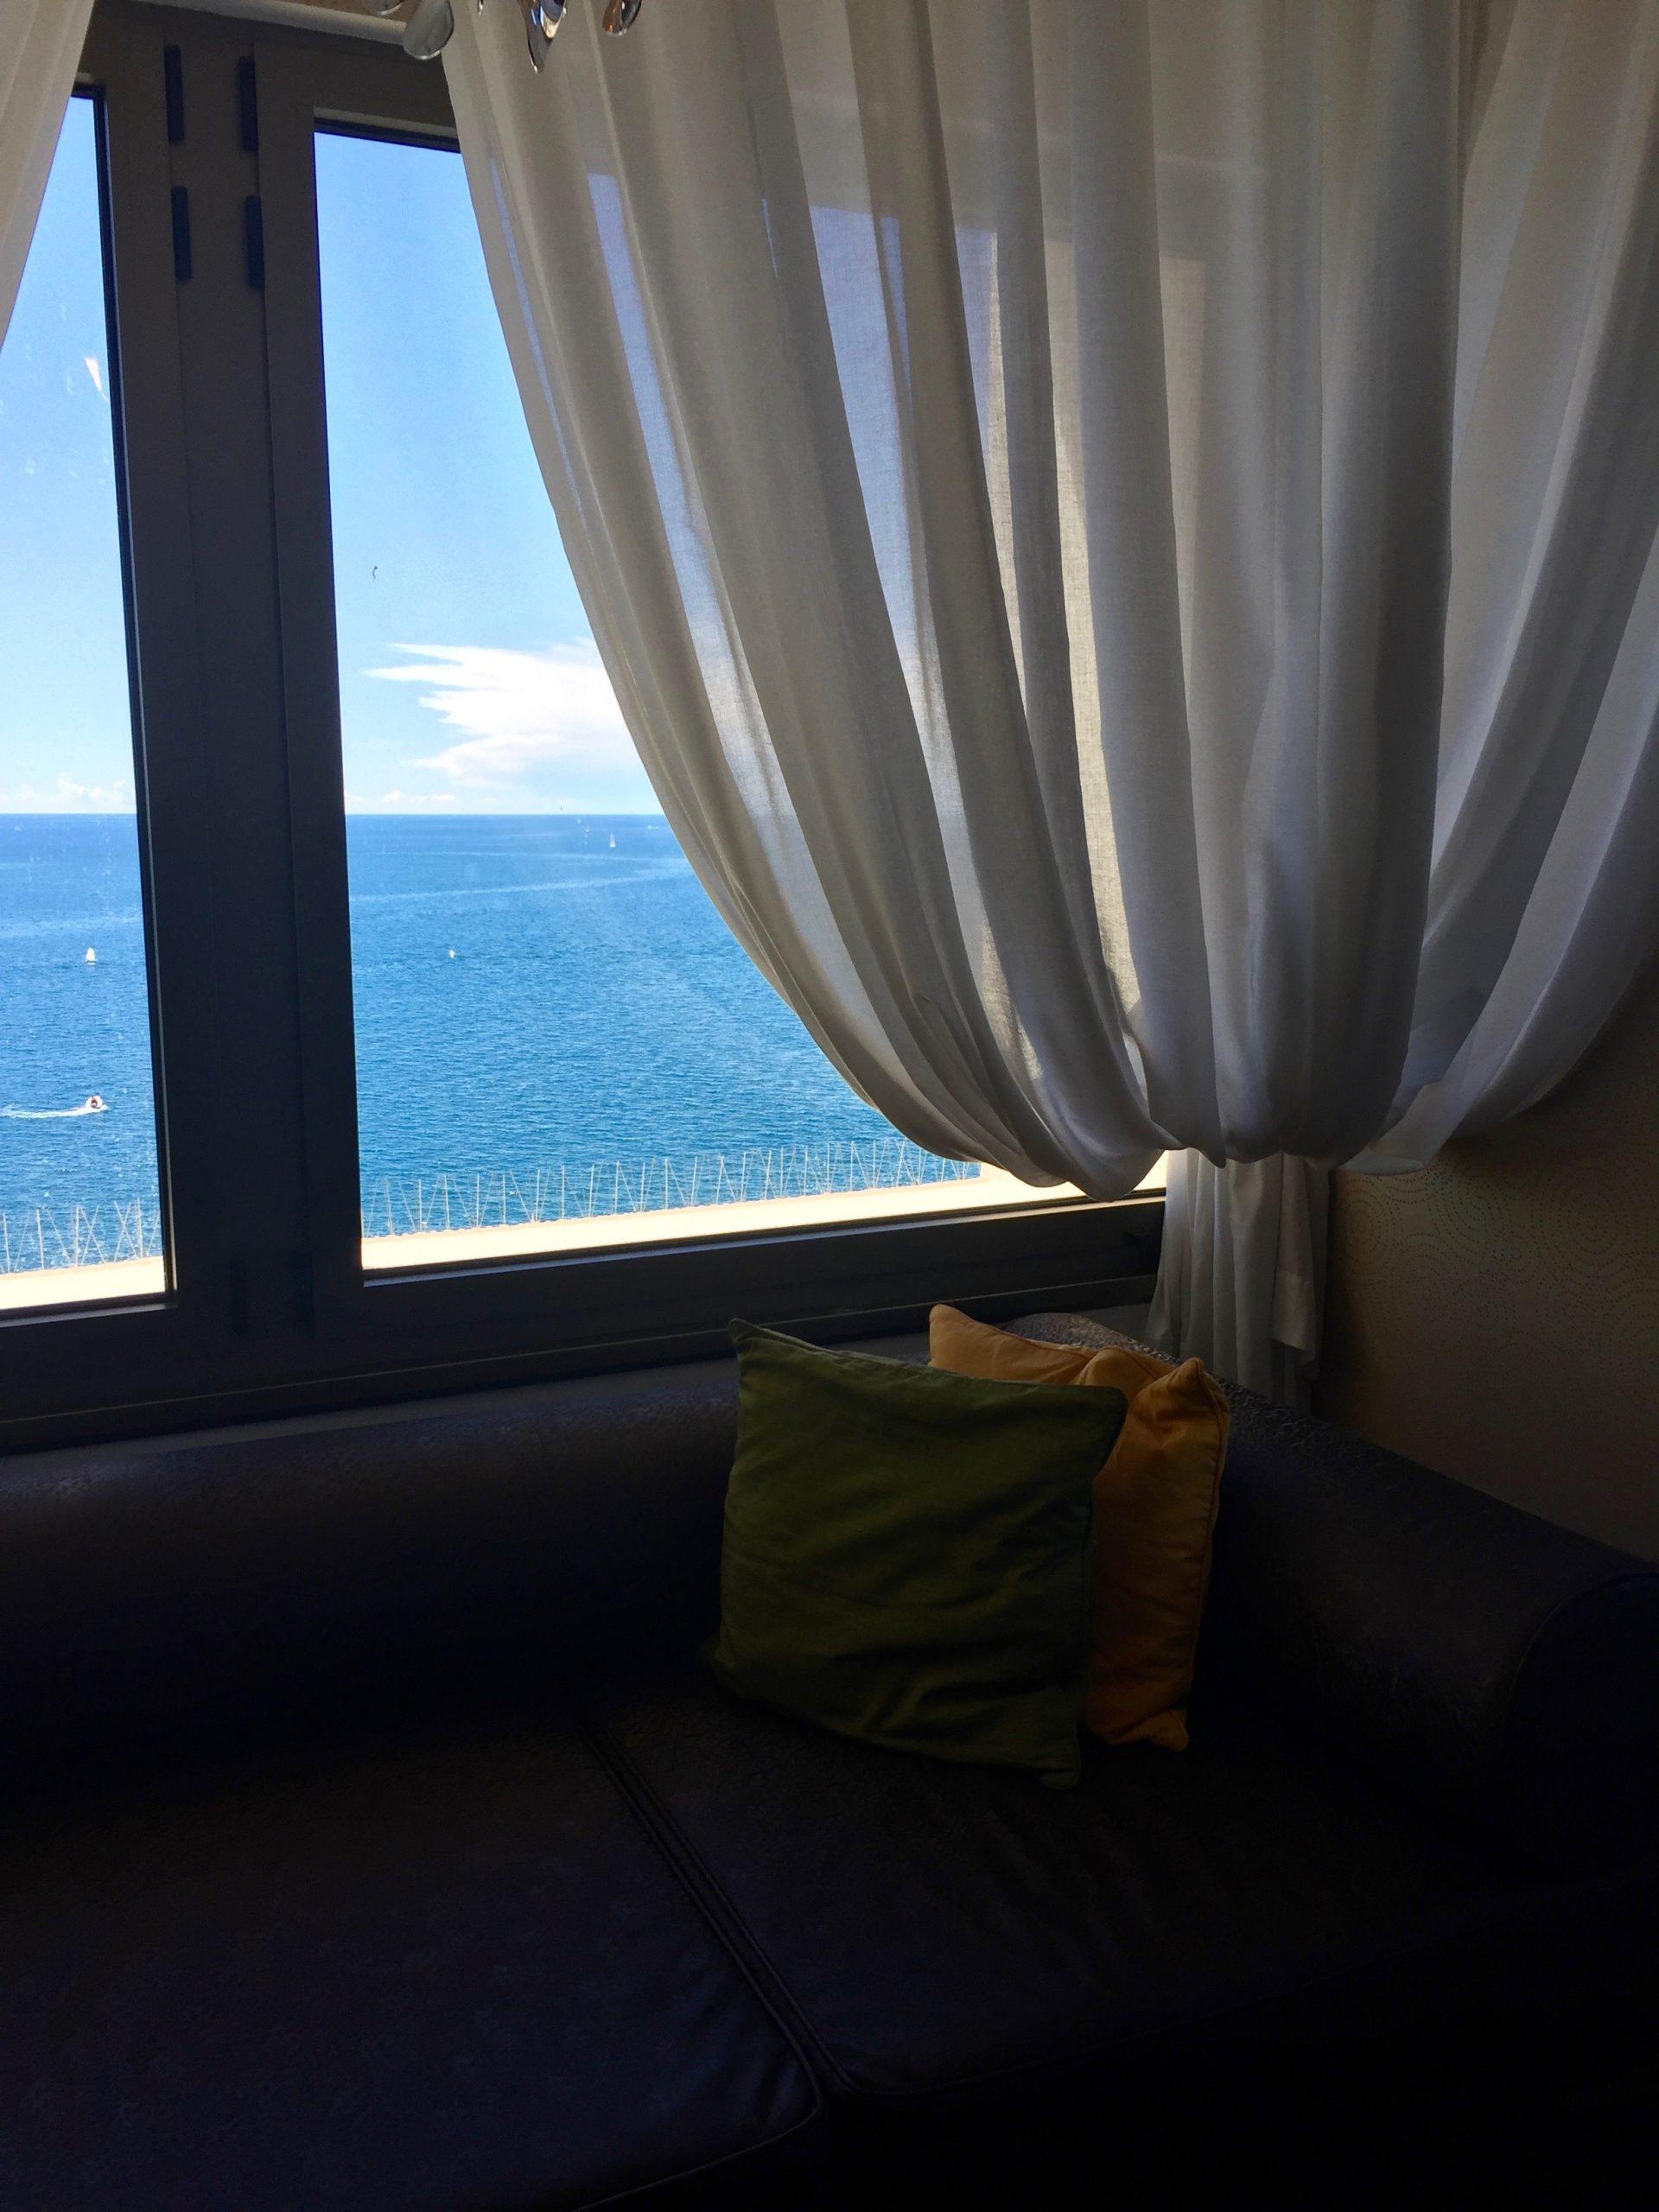 Afternoon Tea Adriatic Sea Slovenia Piran Portorose